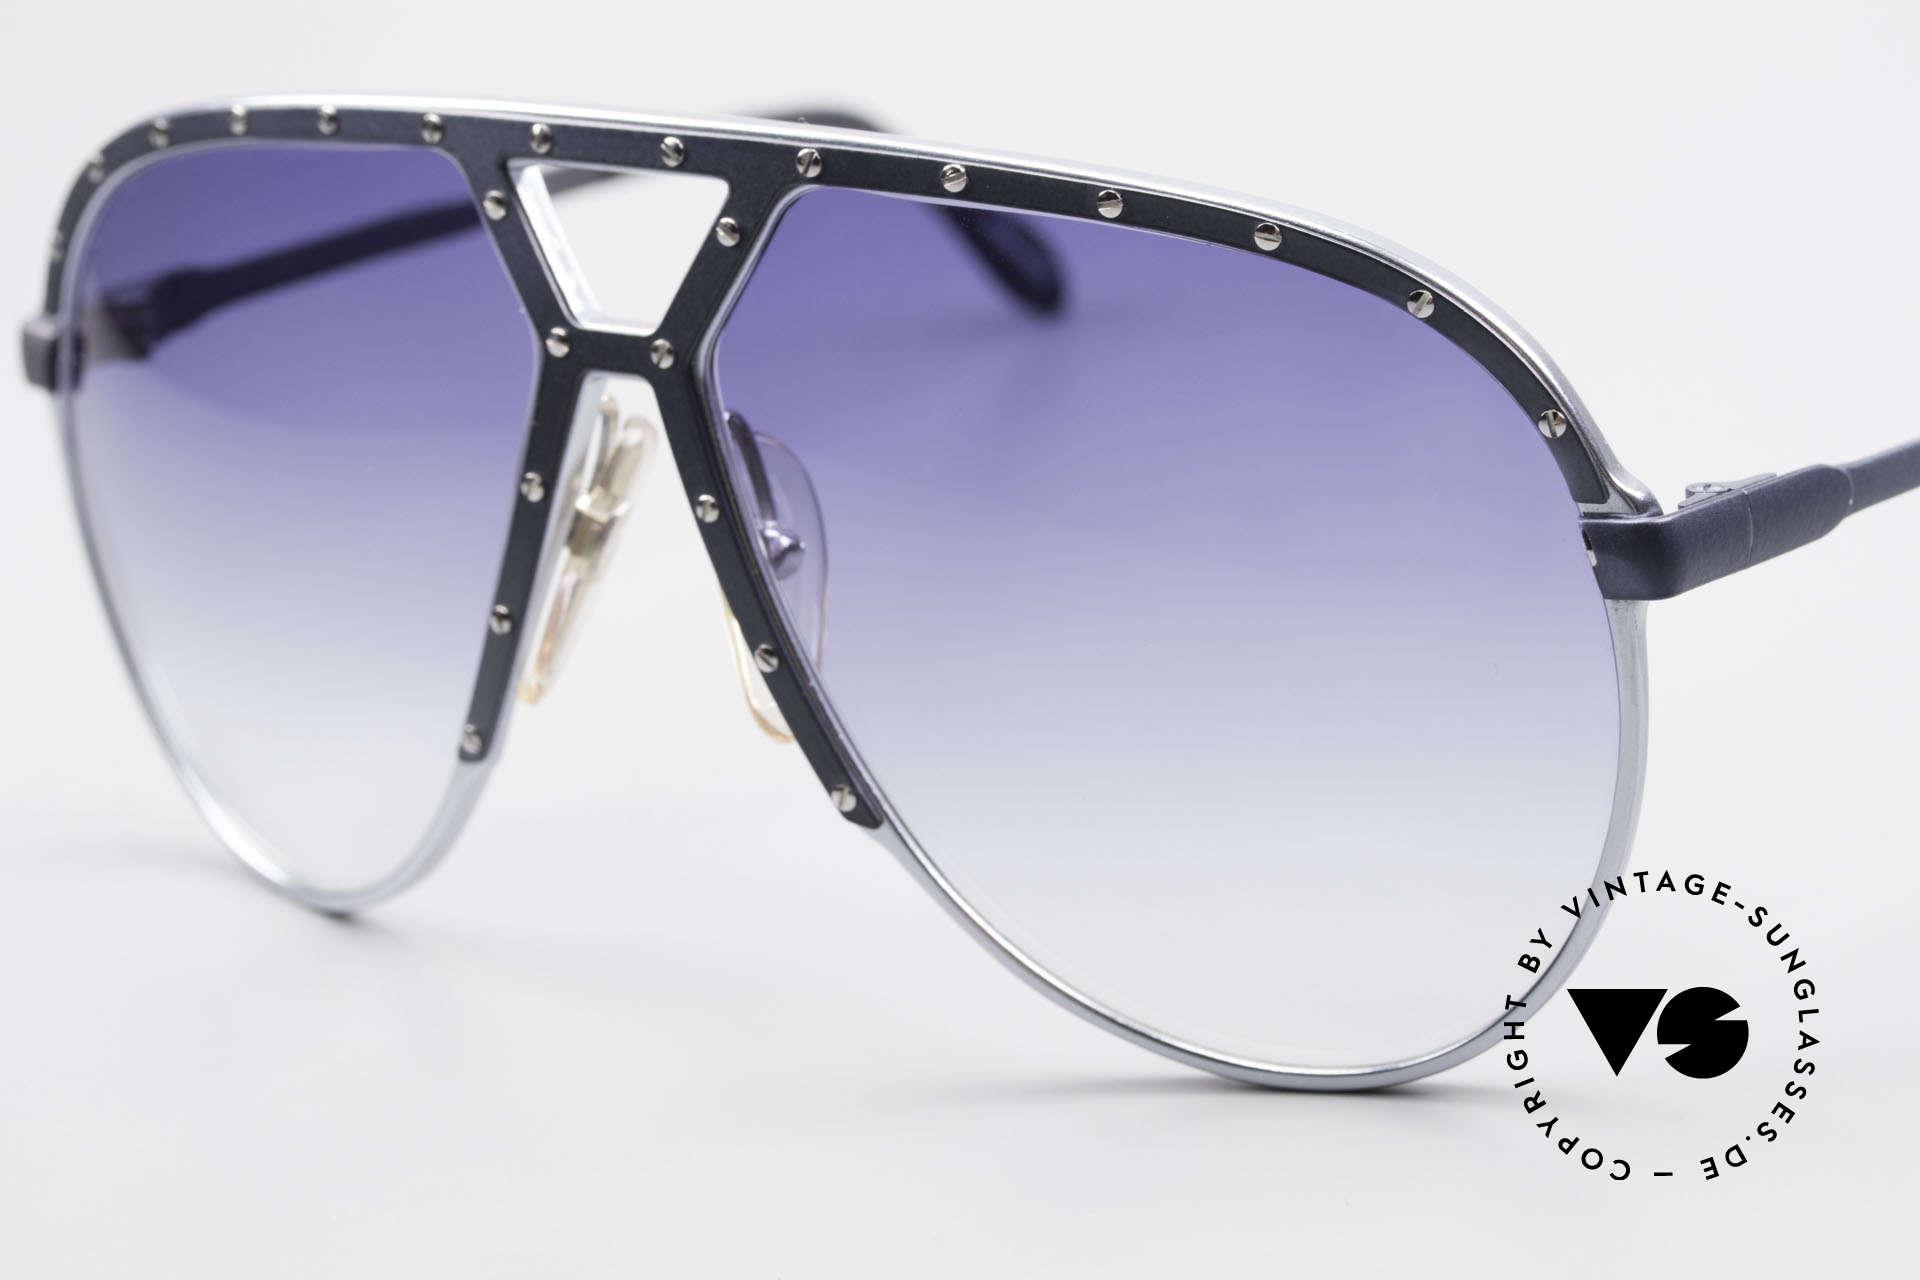 Alpina M1 Extra Large M1 80's Sunglasses, handmade aluminium frame (WEST Germany), 64-14, Made for Men